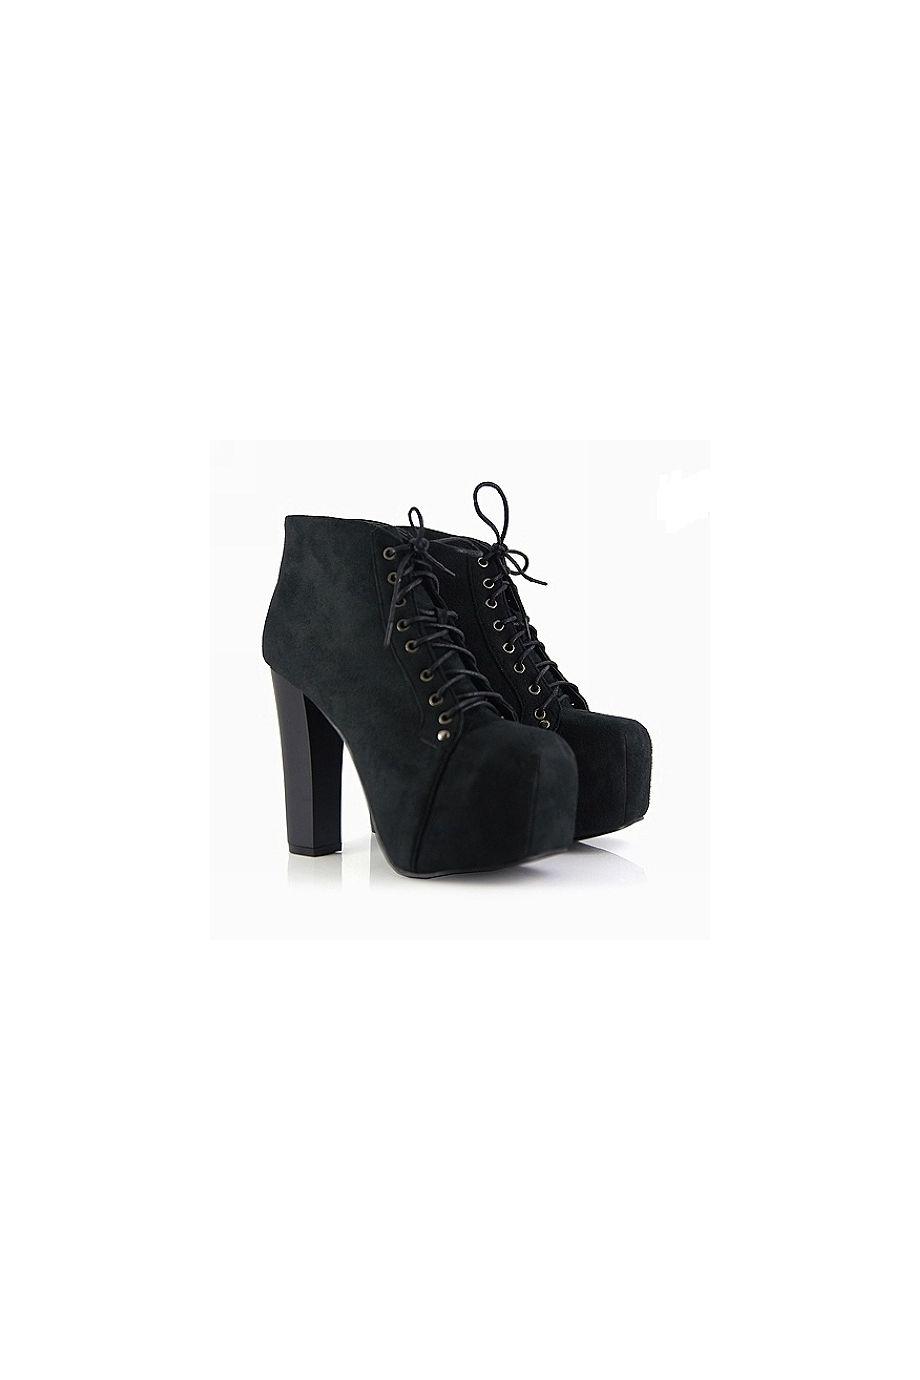 d358f872ed7b ZENA Black Platform Ankle Boots